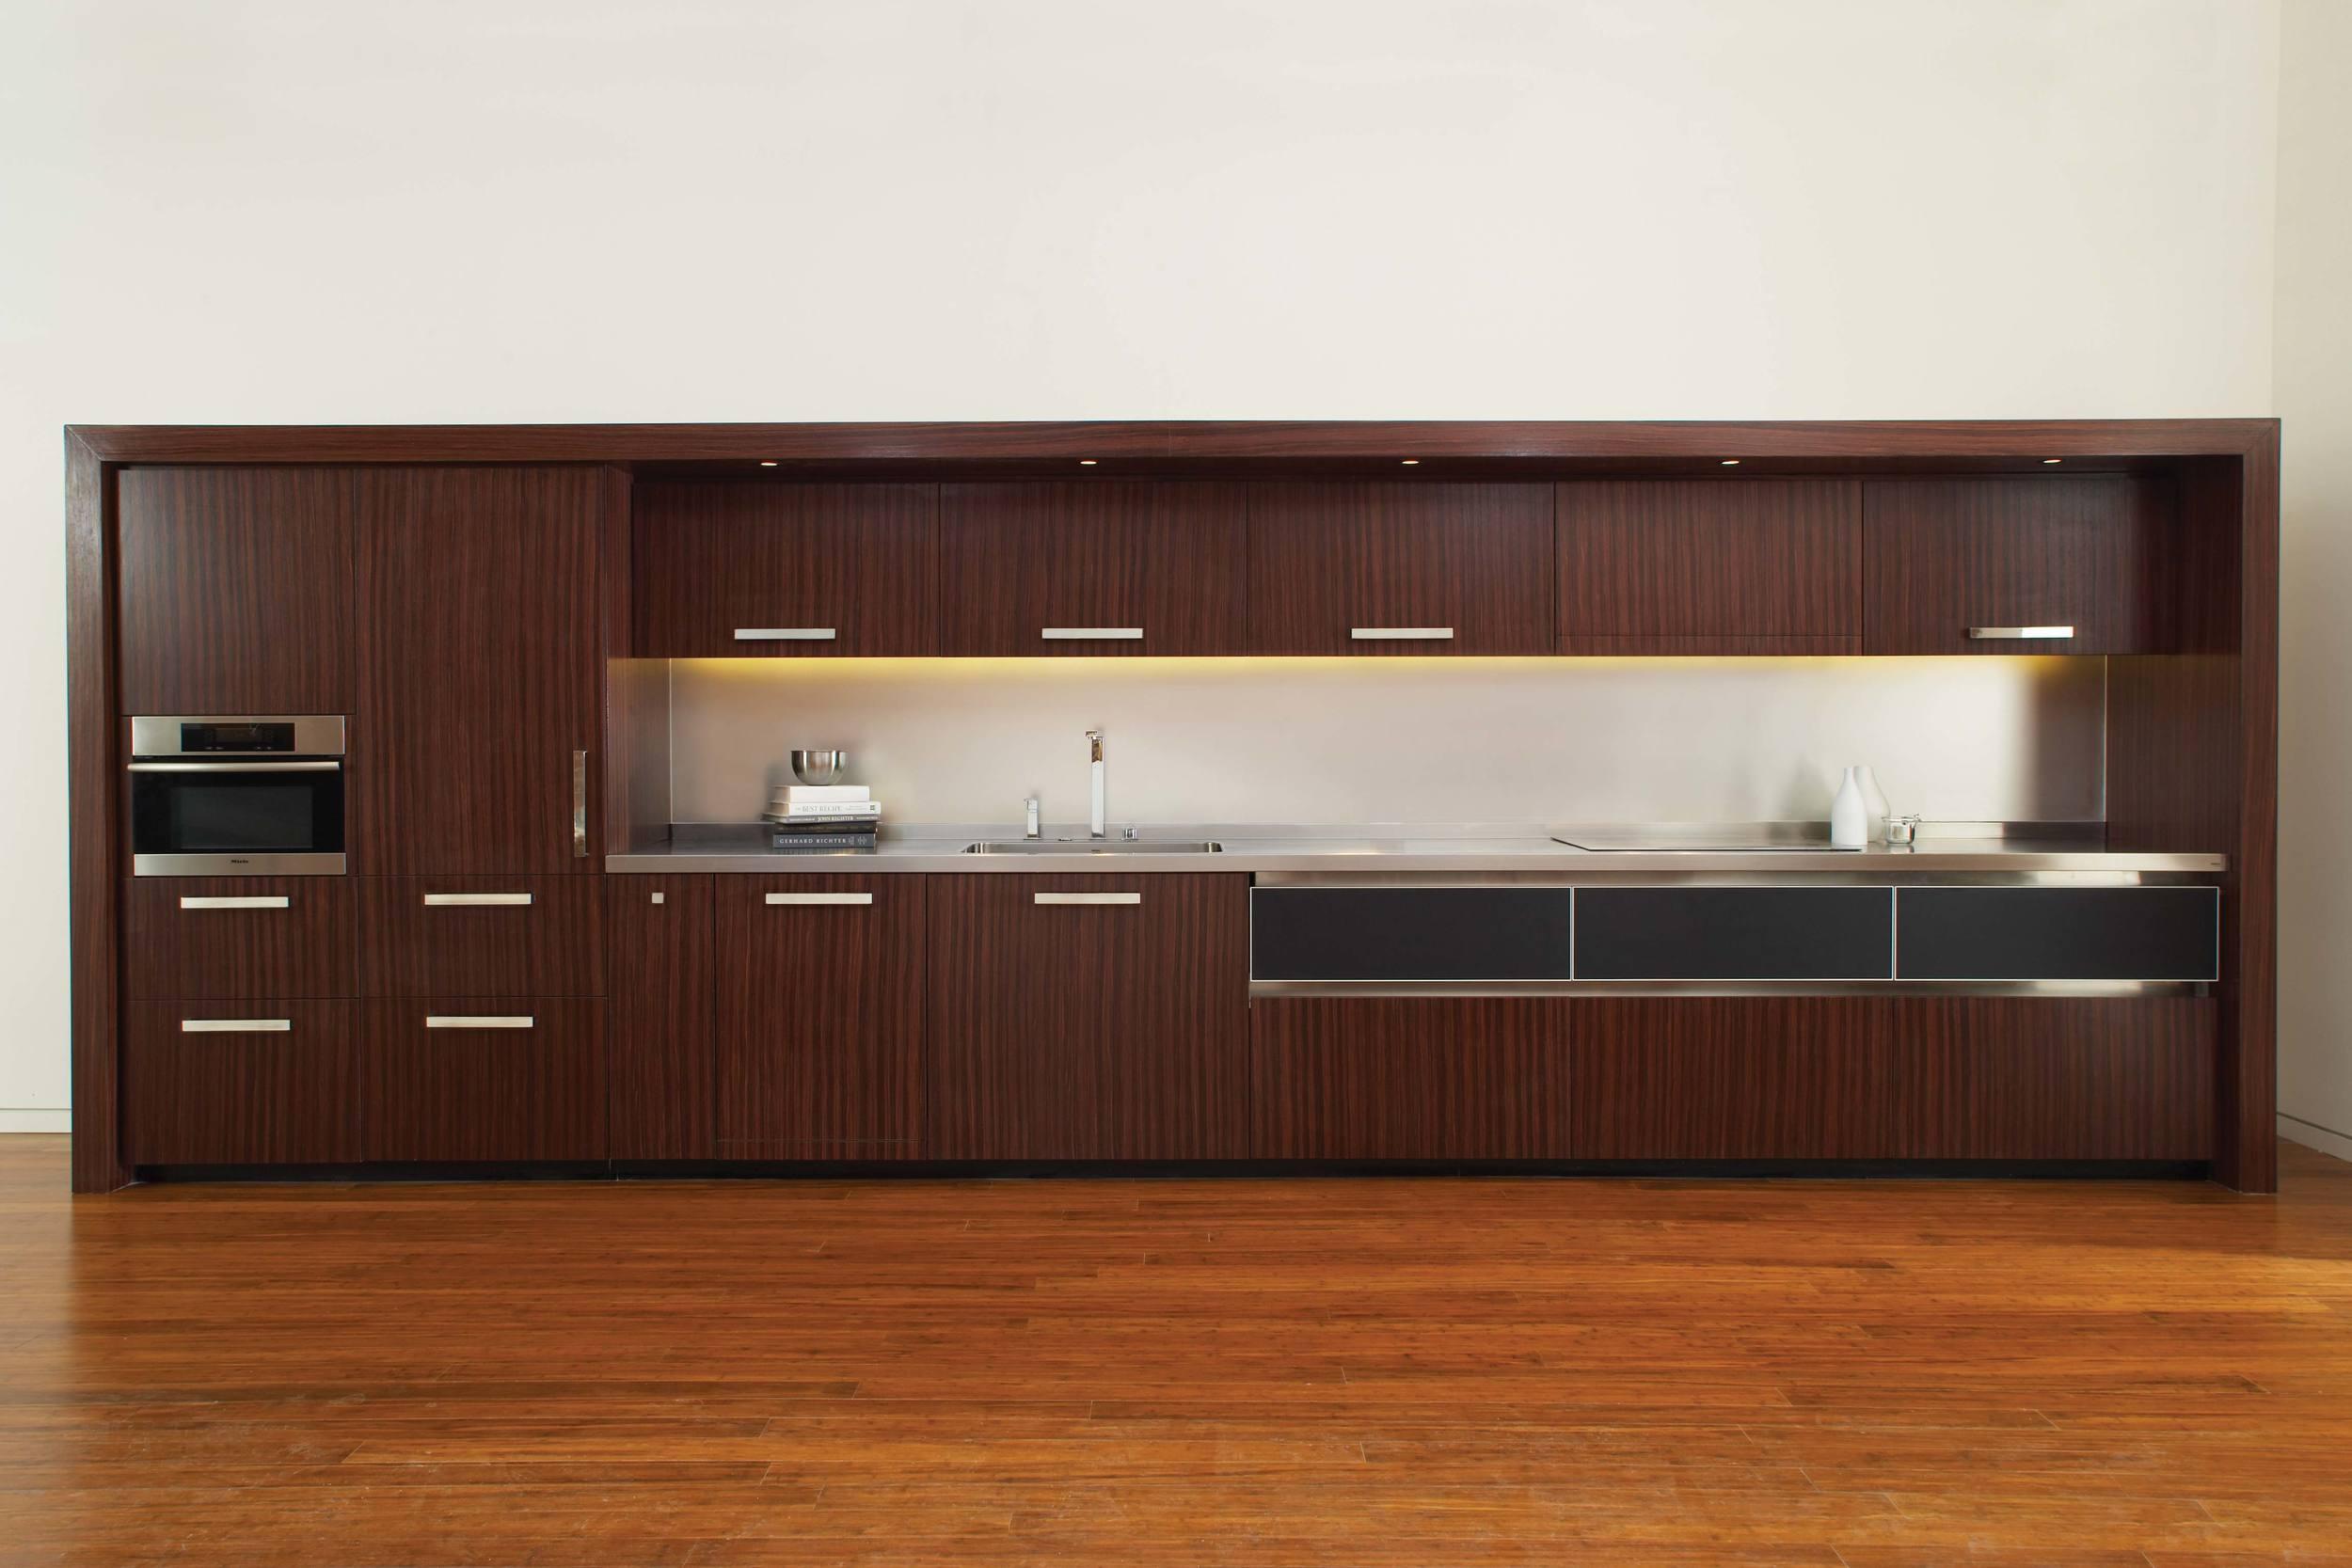 Sozo-Kitchen-Straight-On2.jpg